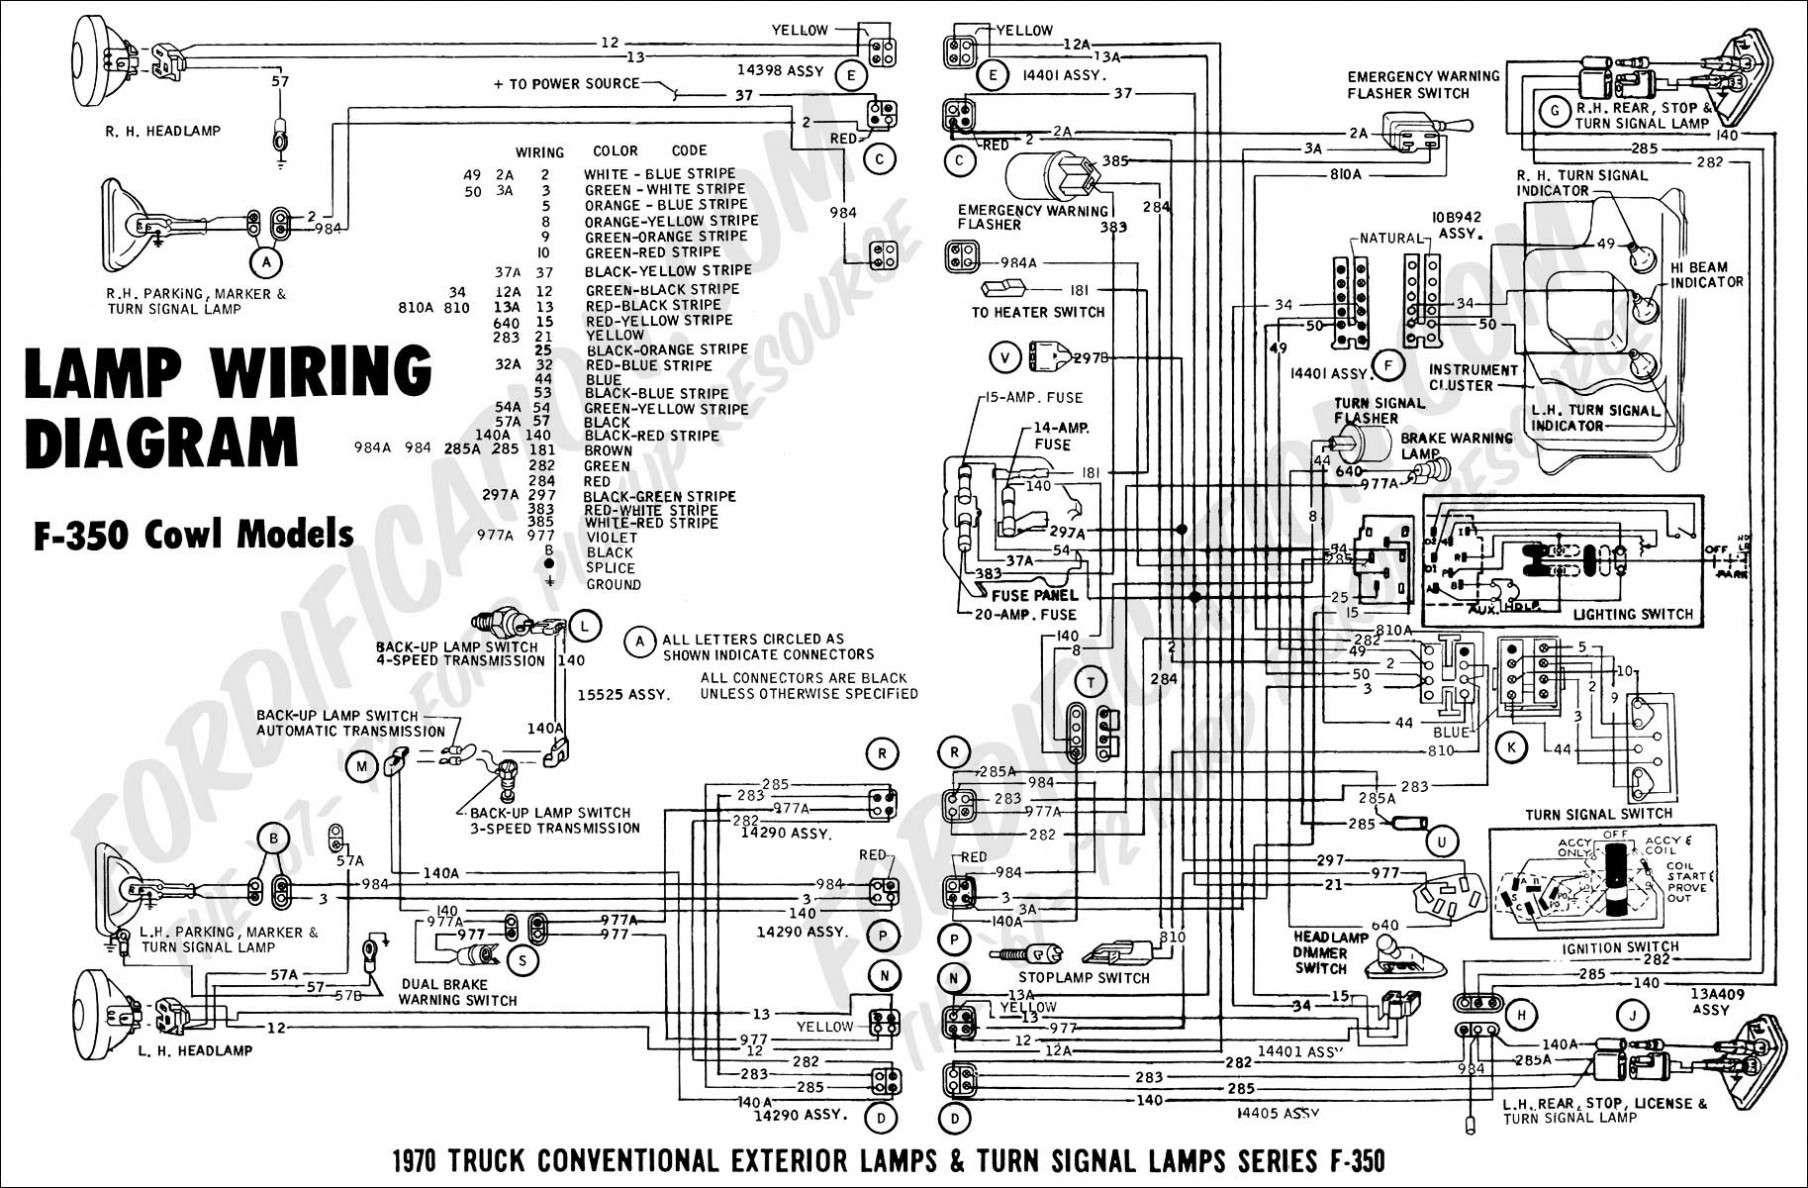 Wiring Diagram Electrical Wiring Diagram Electrical Ford Ranger Diagram Electrical Diagram